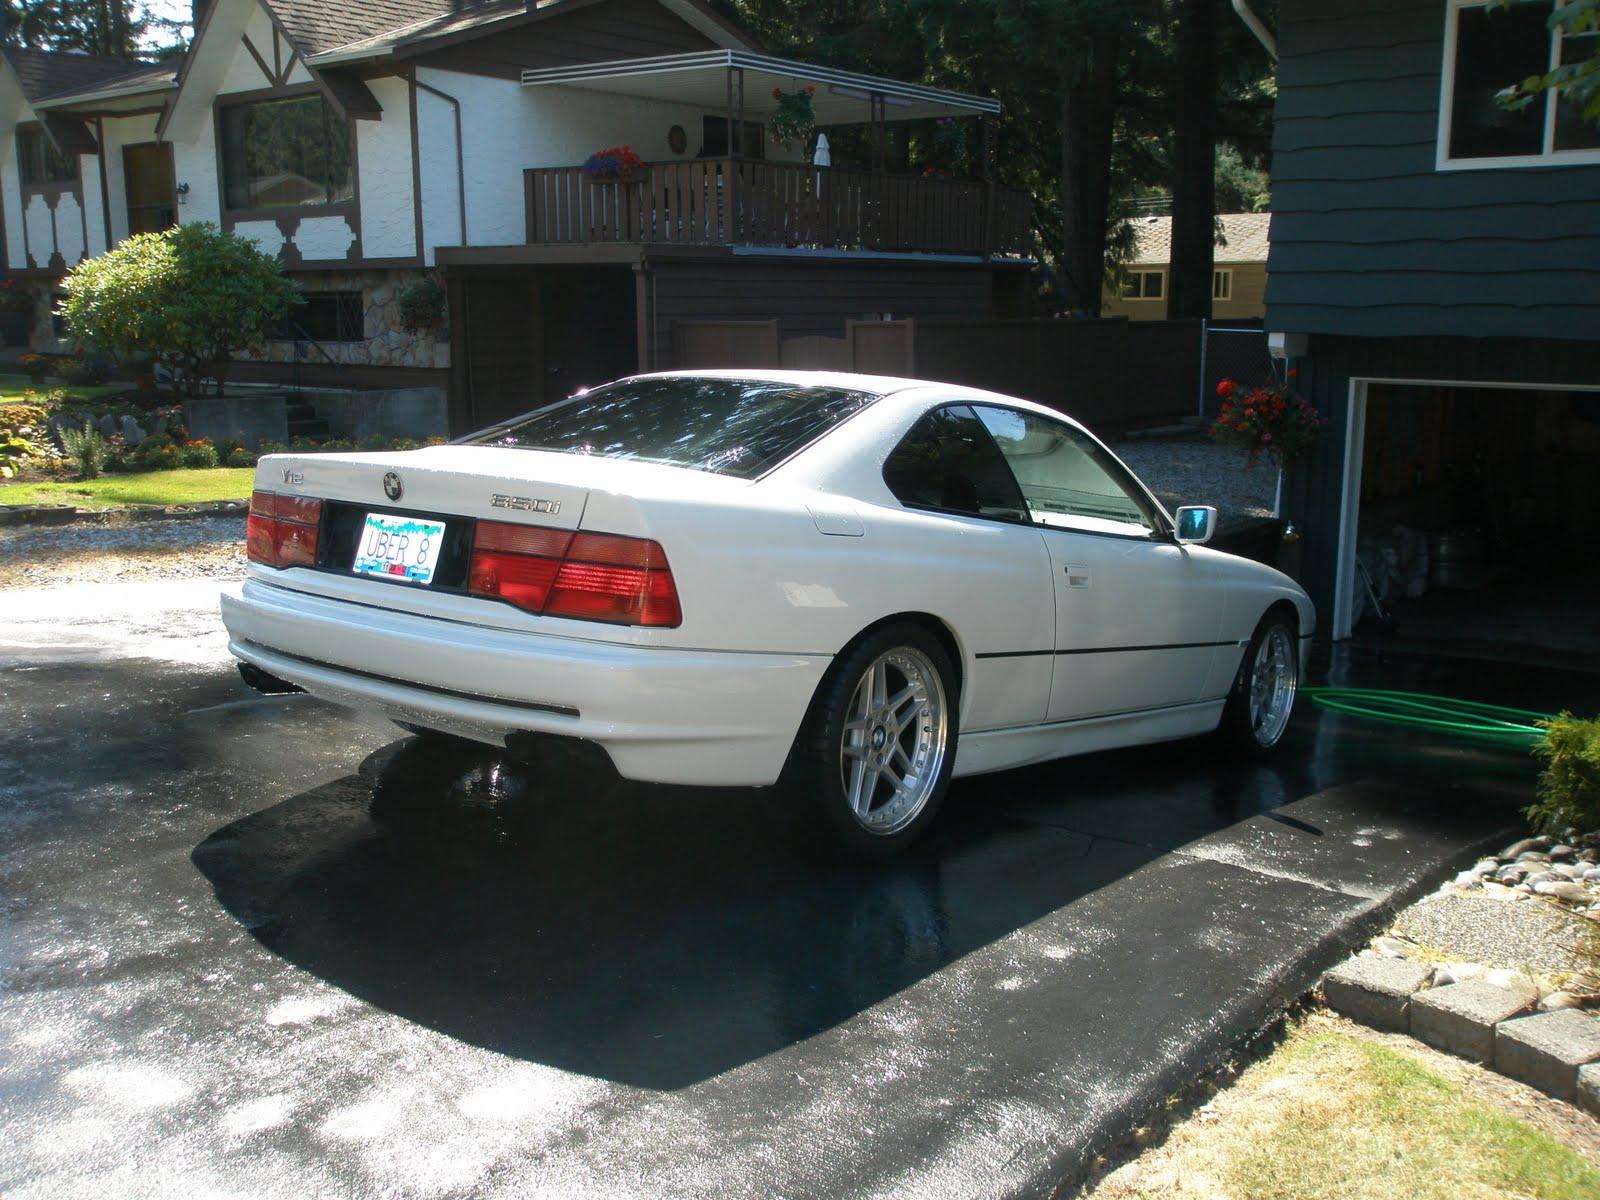 E31 1992 BMW 850i - Alpine White - 1st $12K takes it